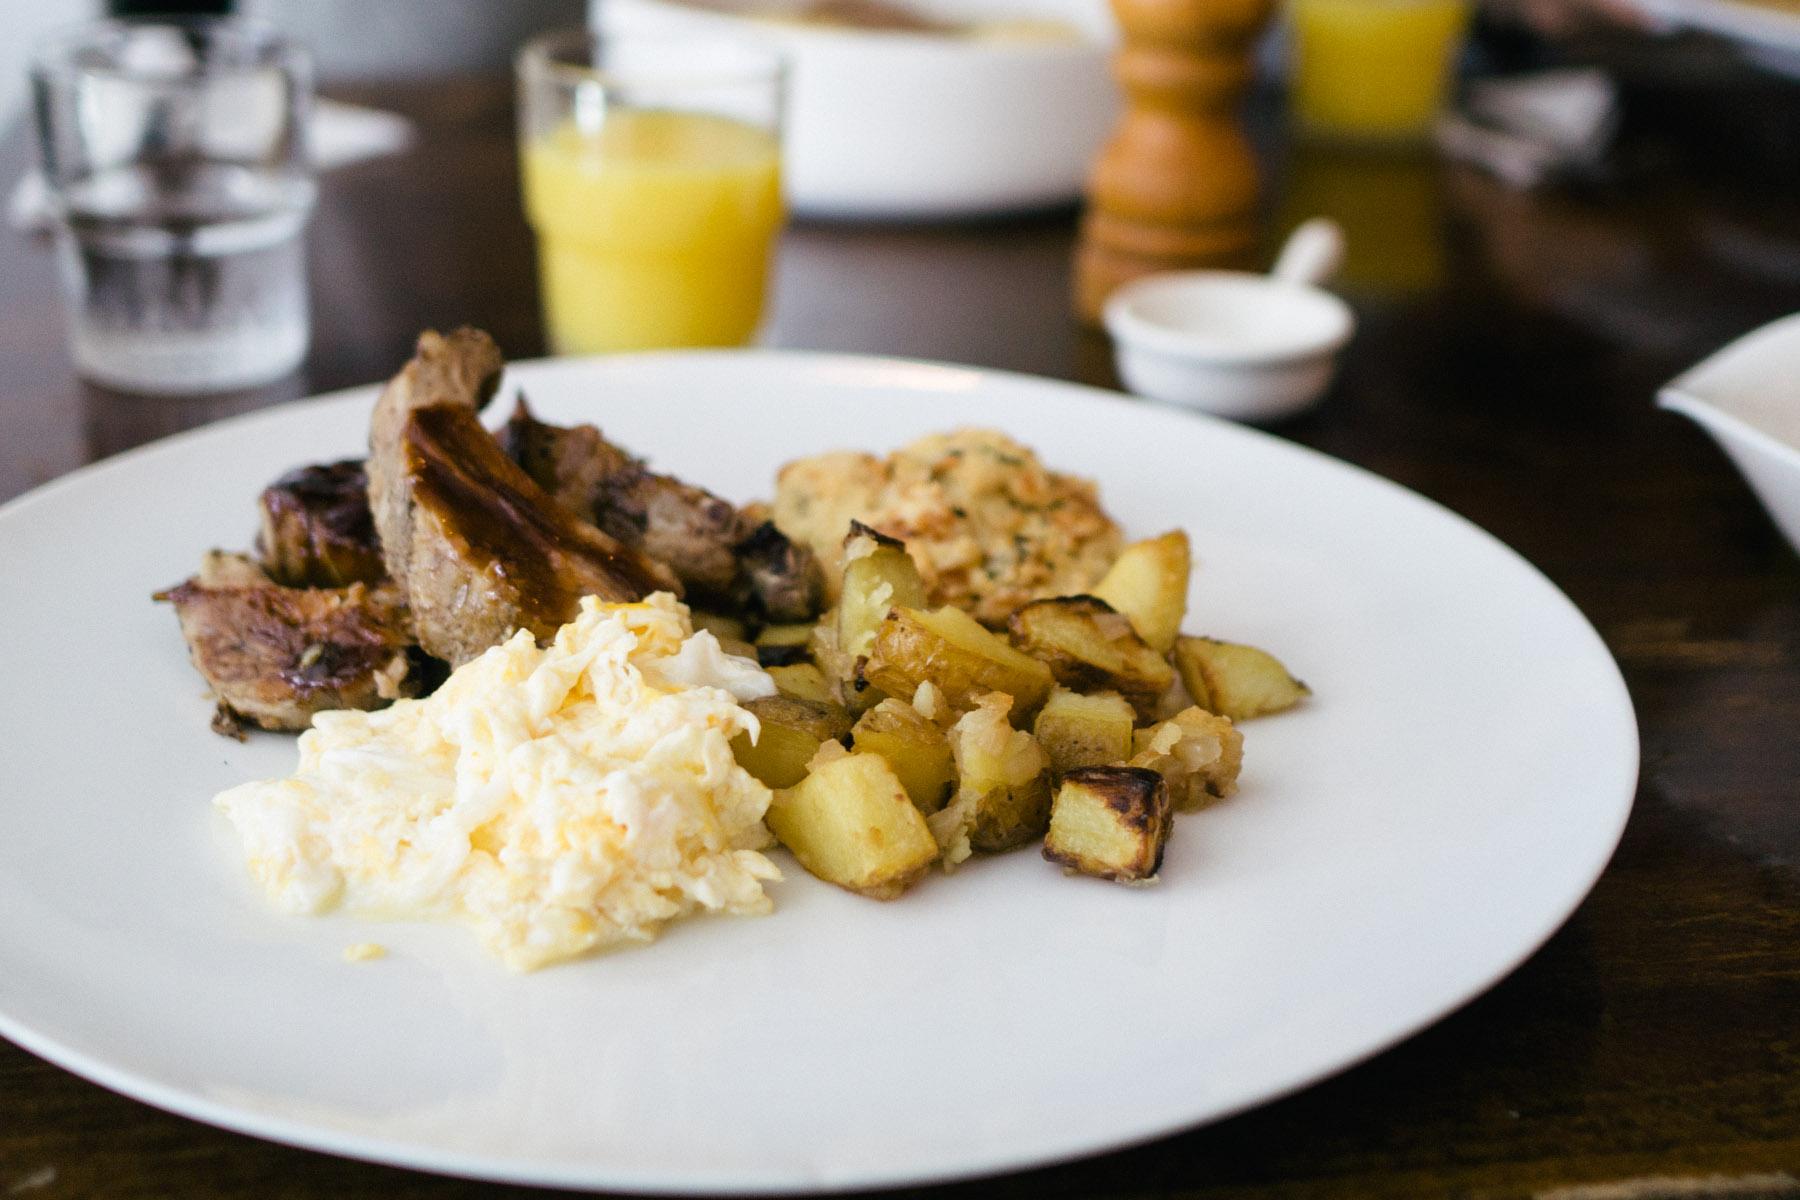 amsterdam-netherlands-jordaan-westerstraat-restaurante-fraiche-brunch-dinner-5